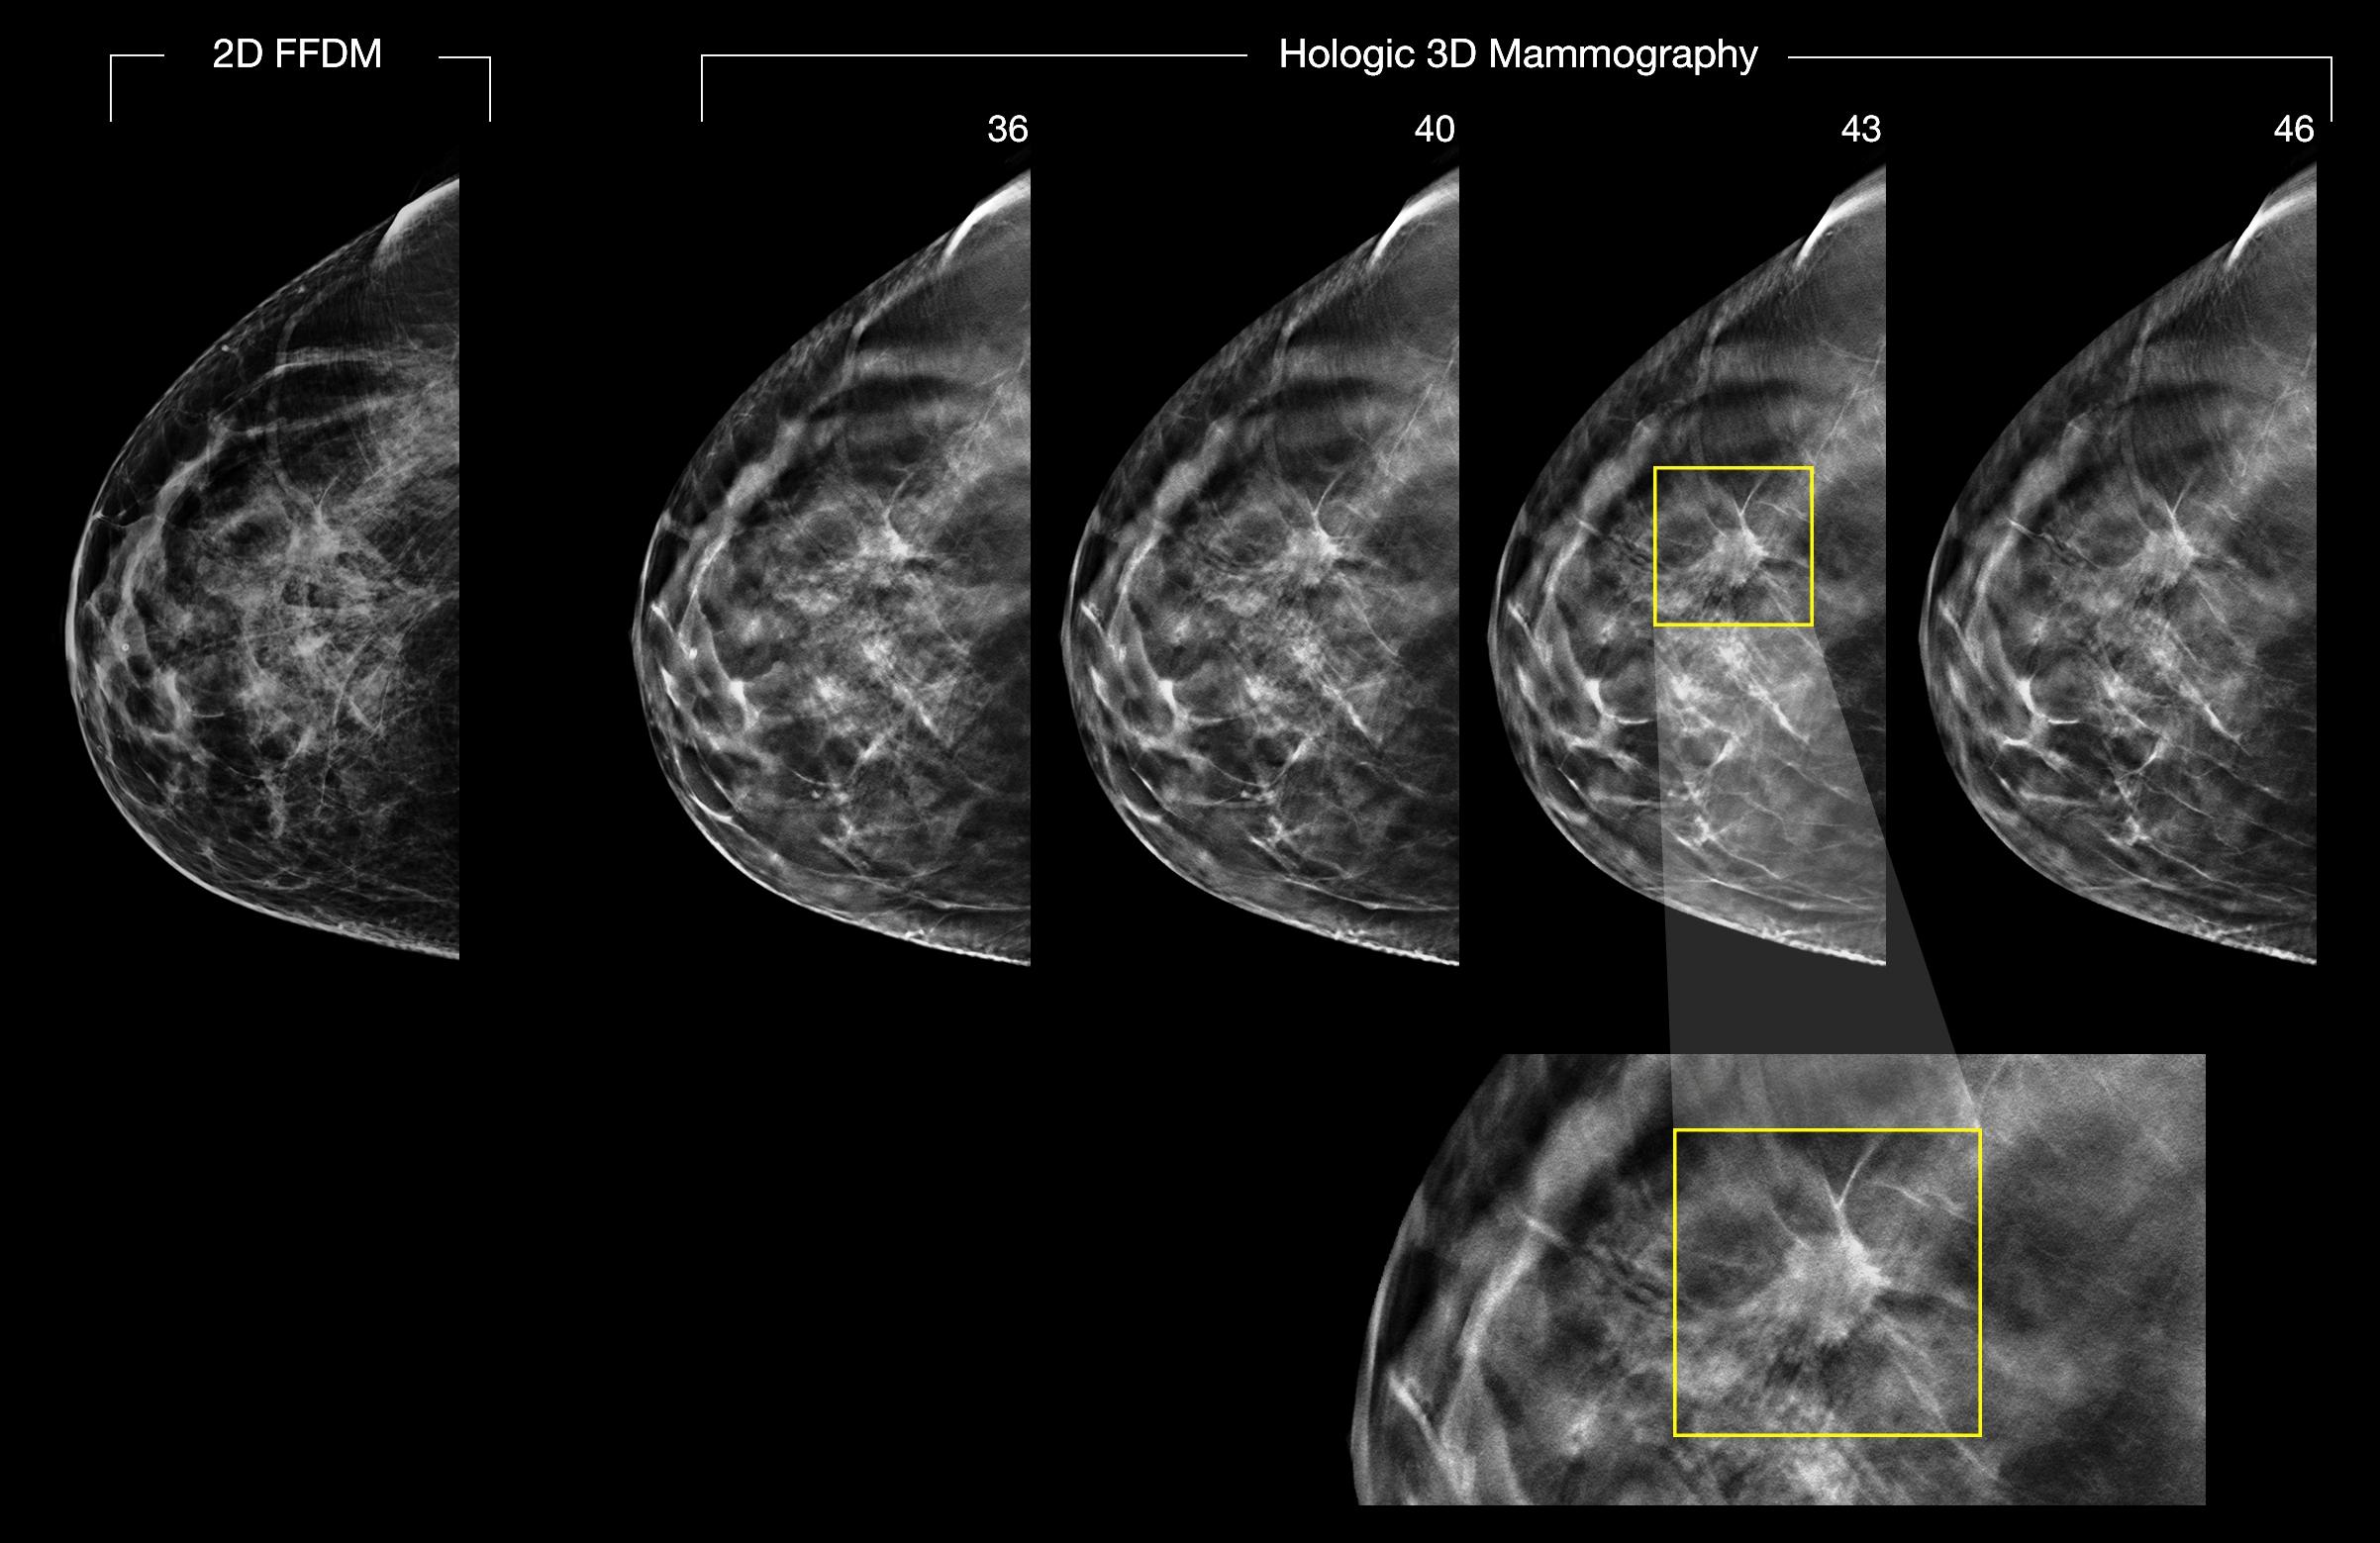 2-D and 3-D digital breast images